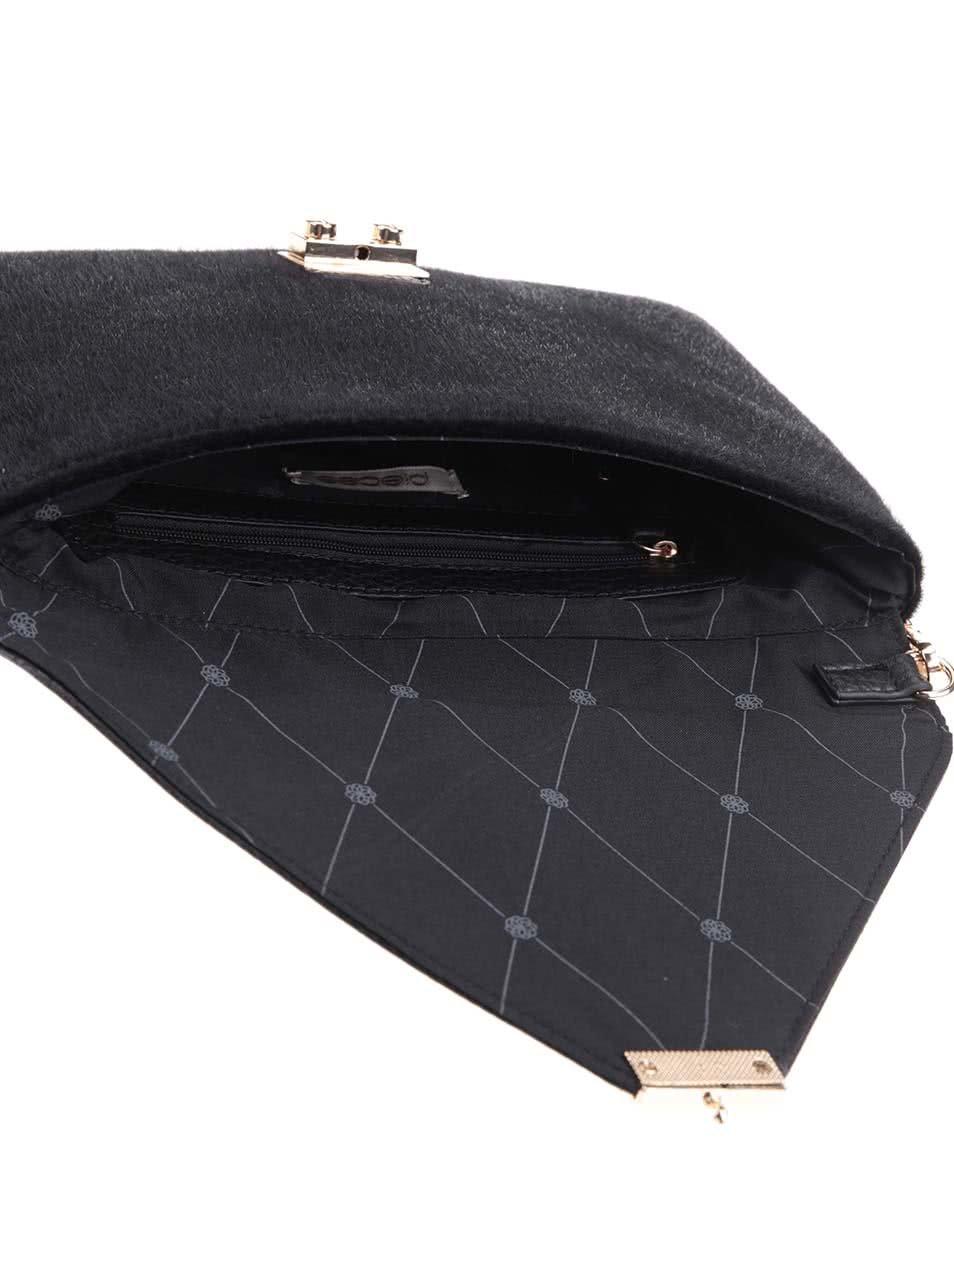 Čierna listová kabelka Pieces Rihanna ... 85bc81289bc